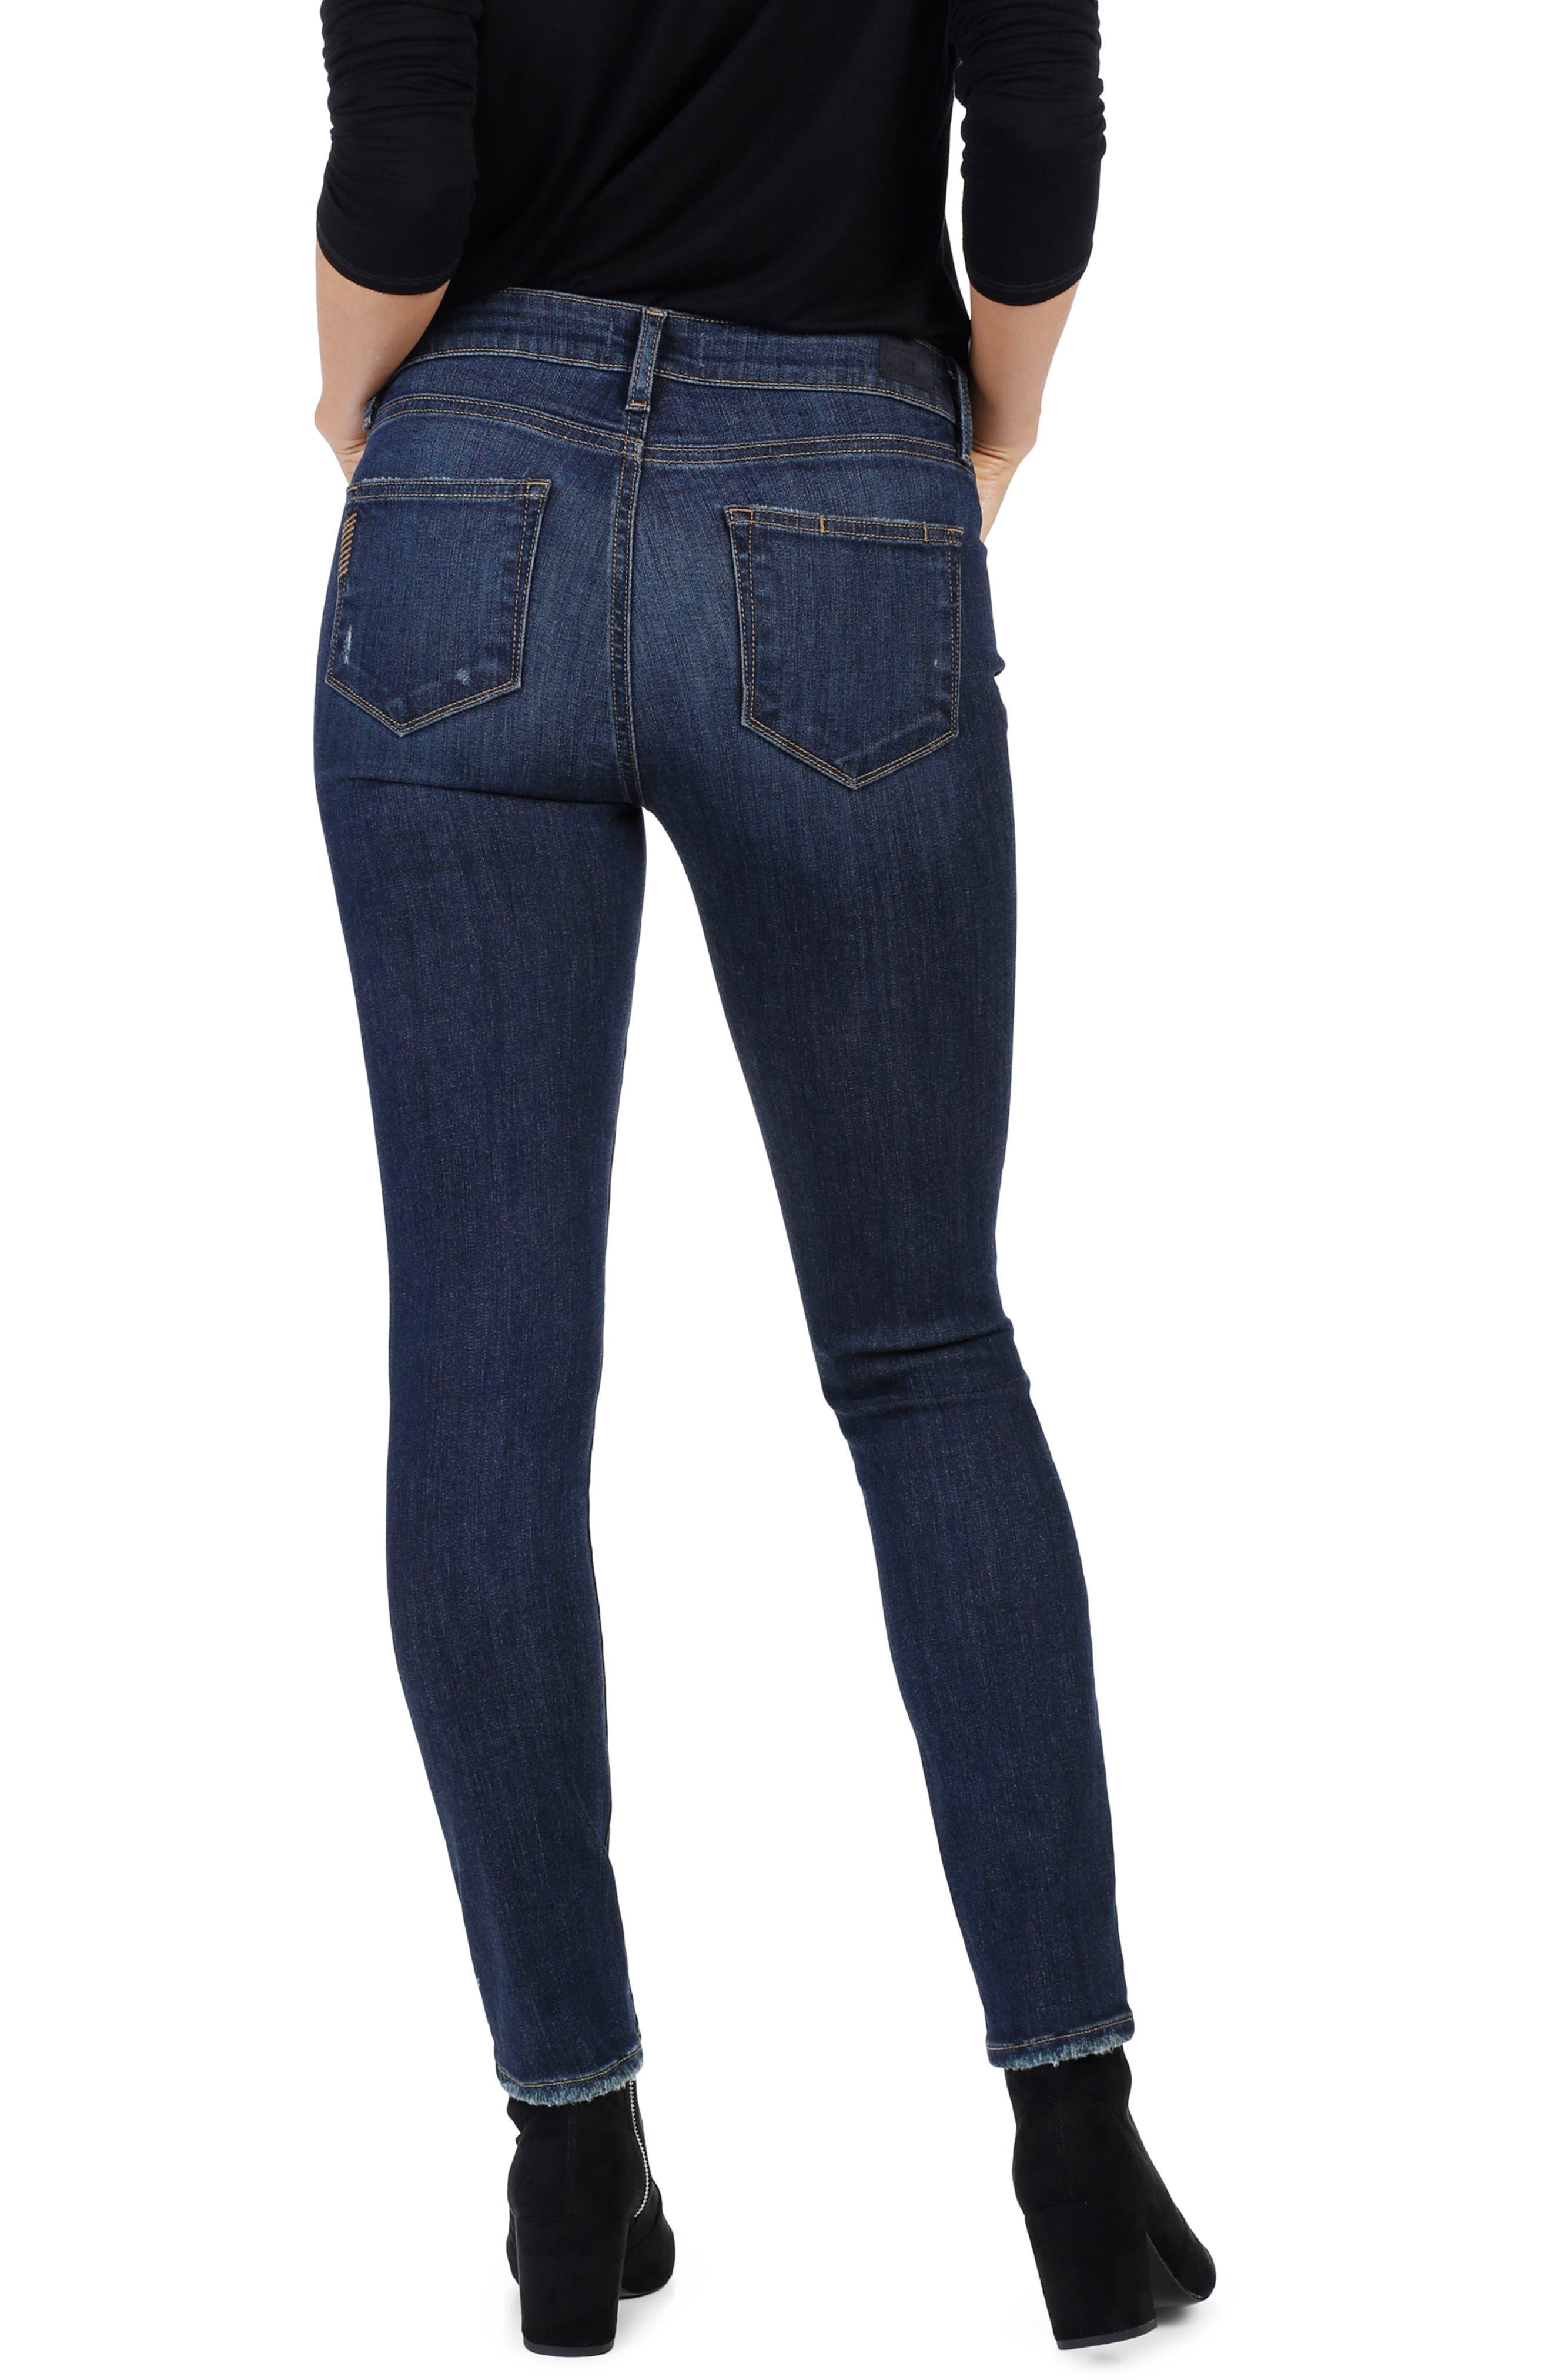 Alternate Image 2  - PAIGE Transcend Vintage - Verdugo Ultra Skinny Jeans (Clearly Destructed)